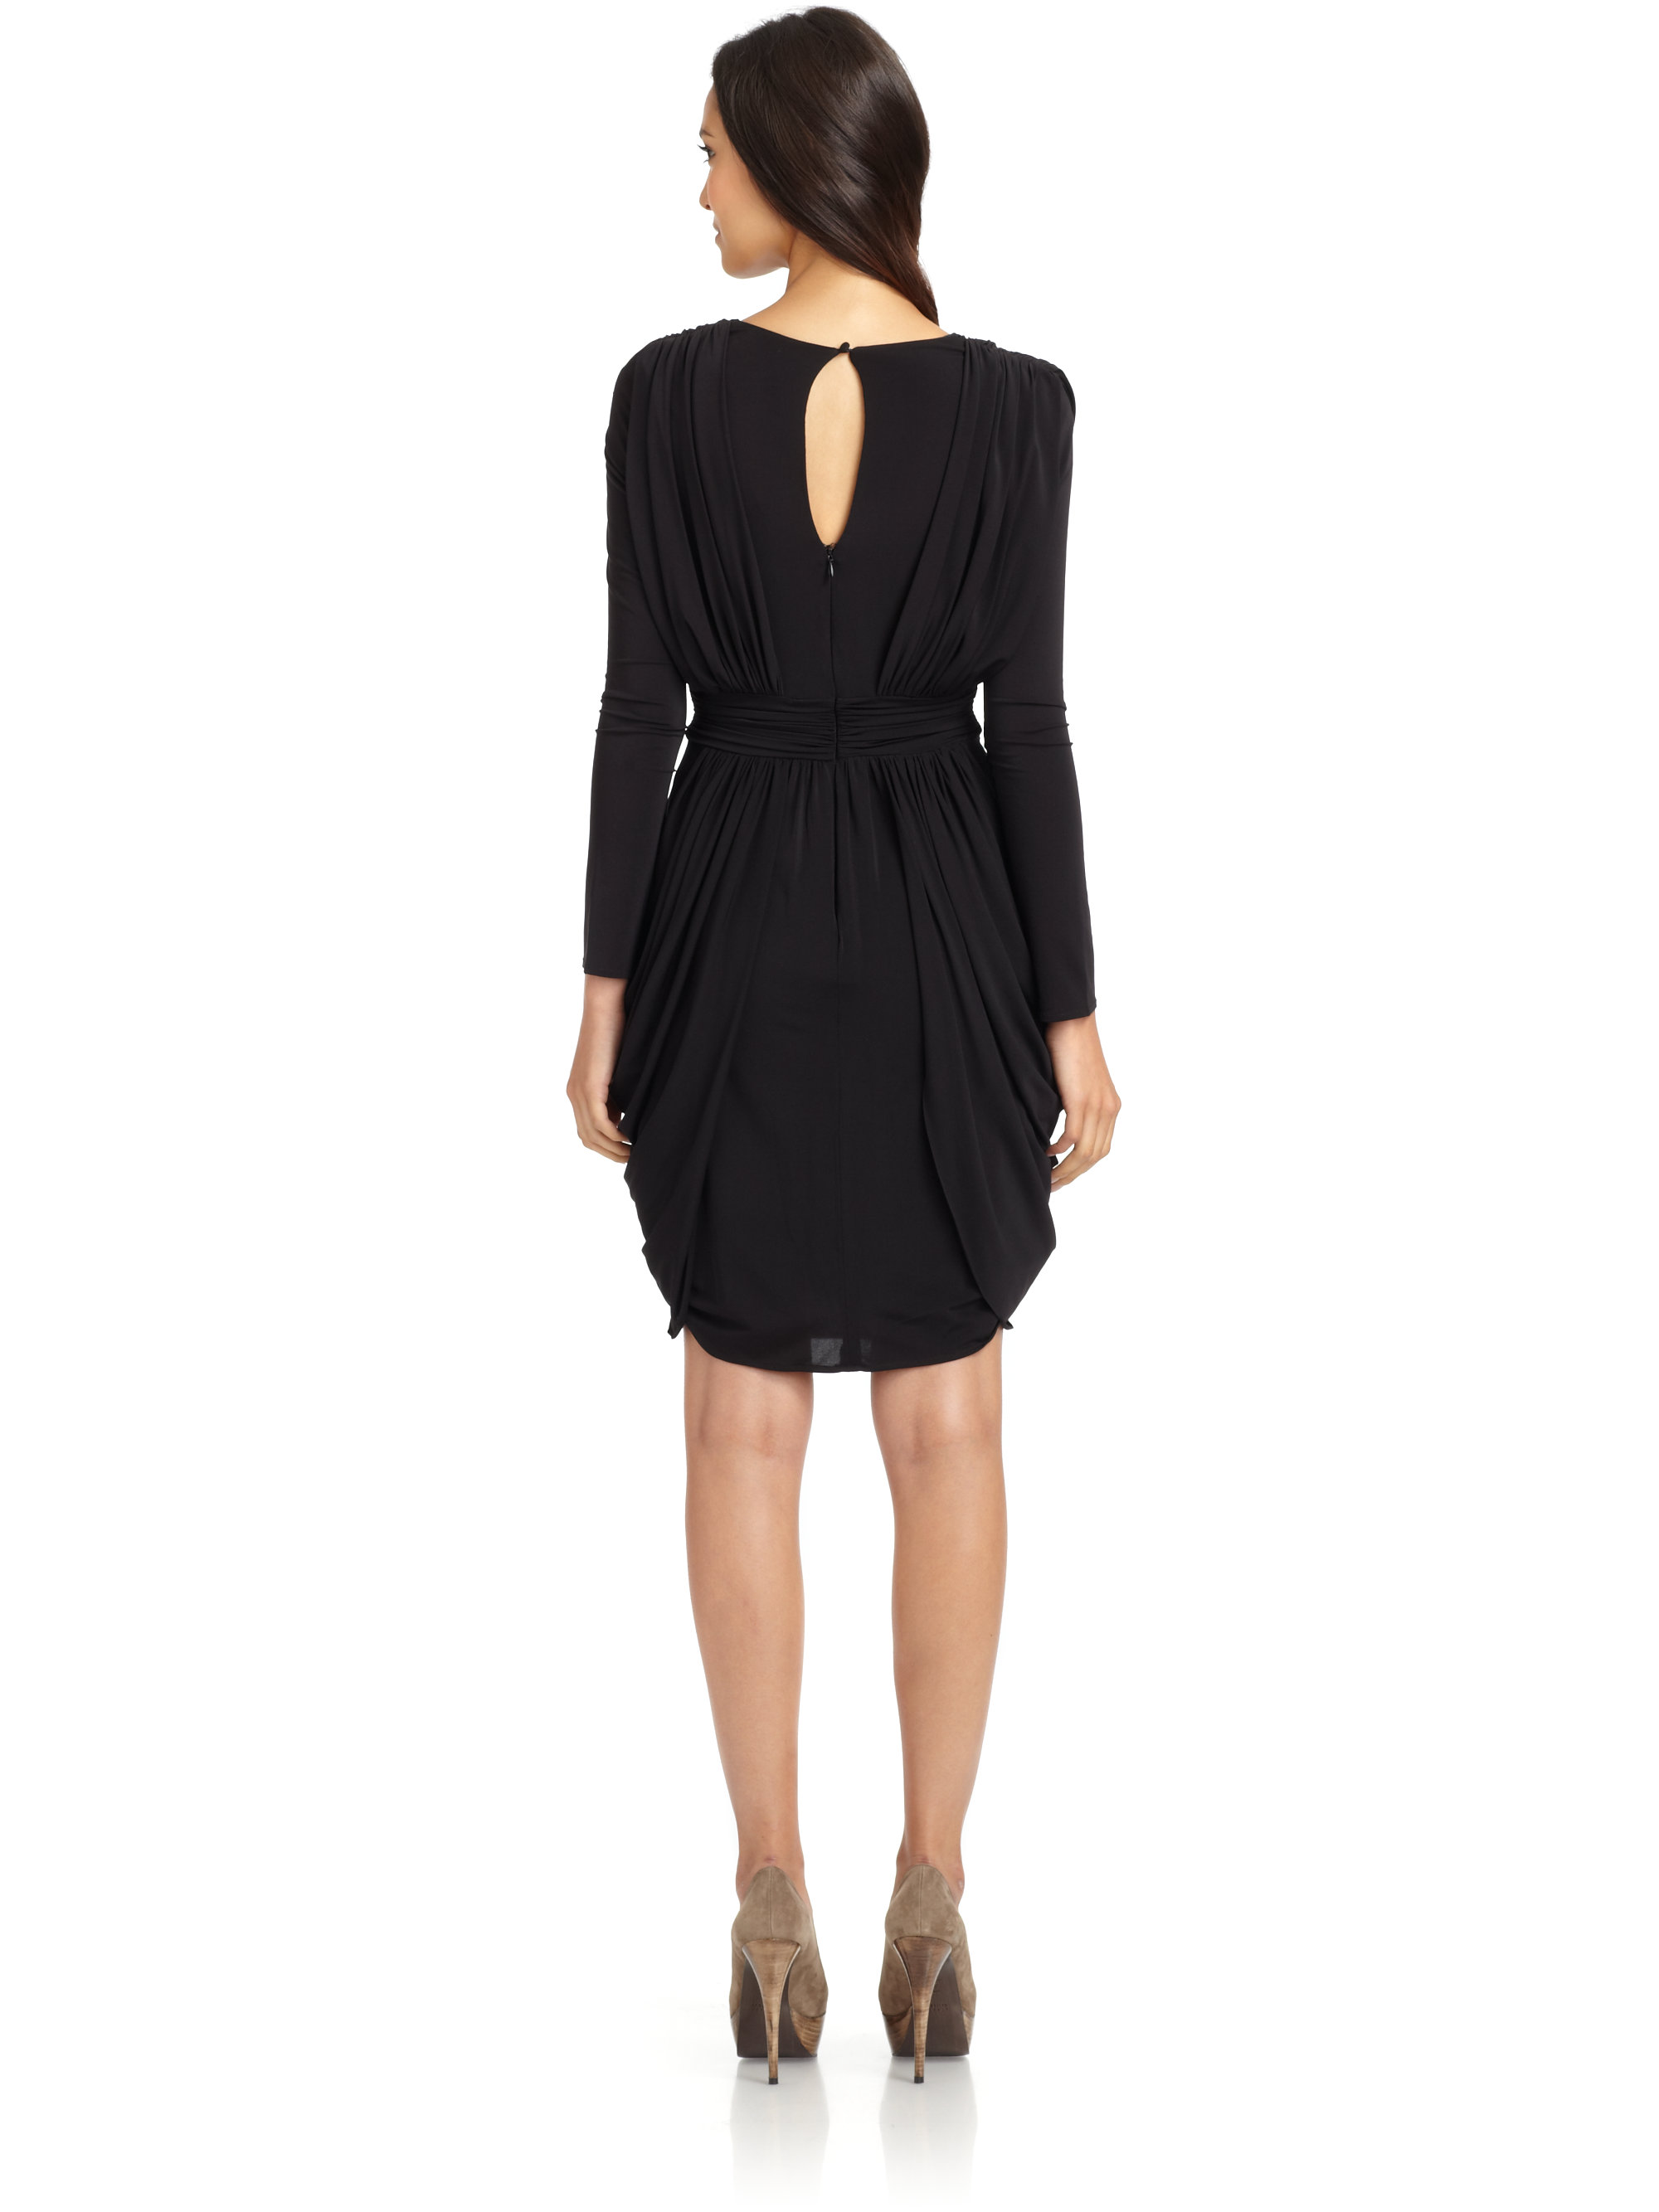 Bcbgmaxazria Lark Draped Cocktail Dress in Black | Lyst